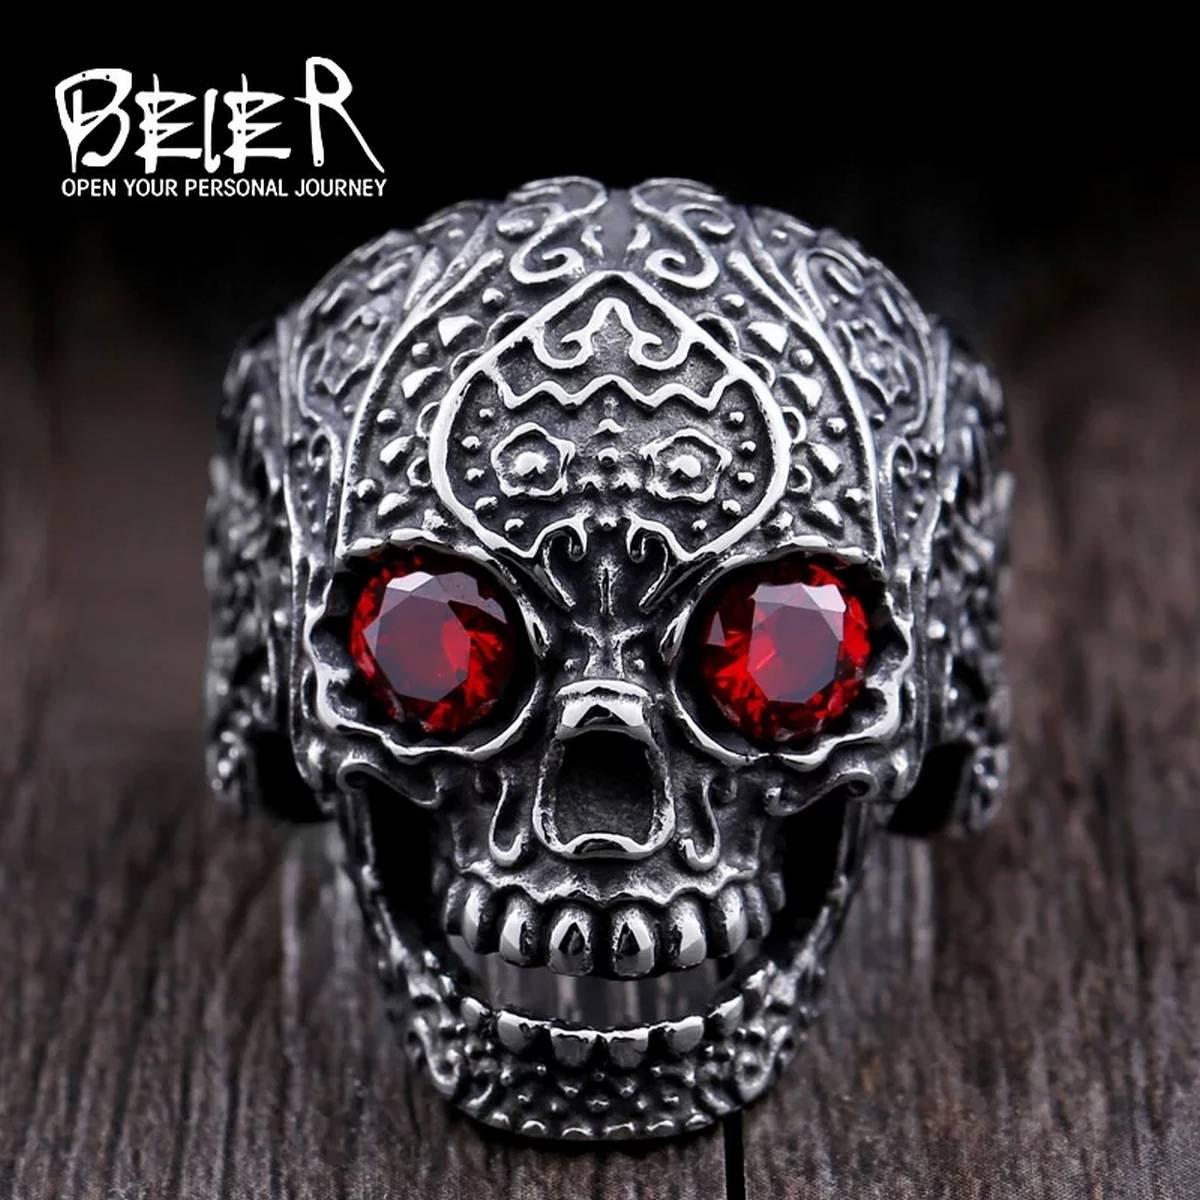 Beier 316L stainless steel ring hot sale punk biker skull man Classic Garden Flower Skull ring fashion jewelry